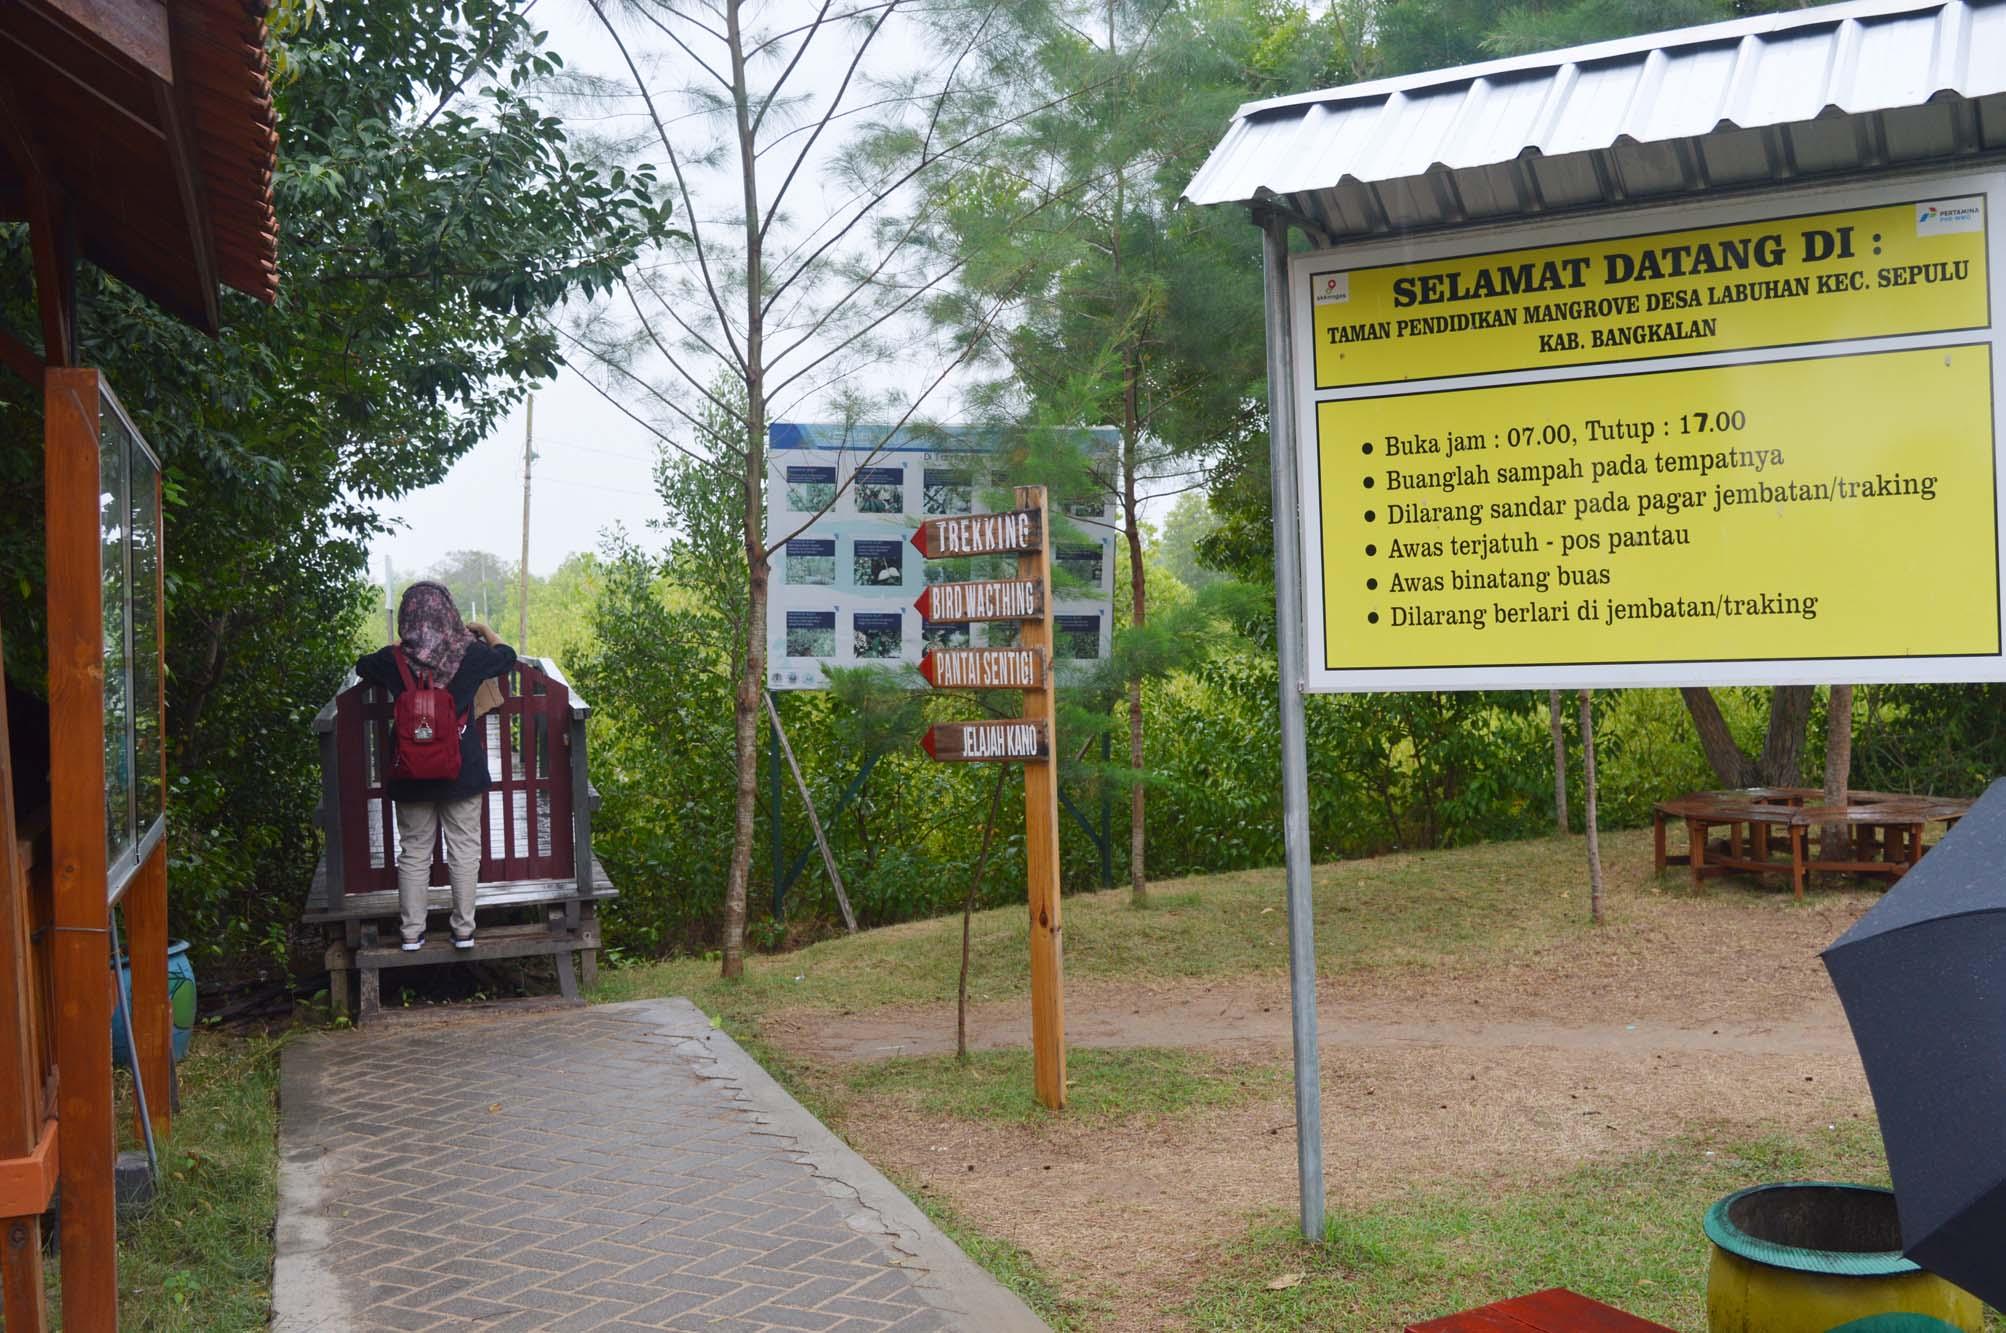 Produk Khas Pesisir Bangkalan Taman Pendidikan Mangrove Labuhan Kab